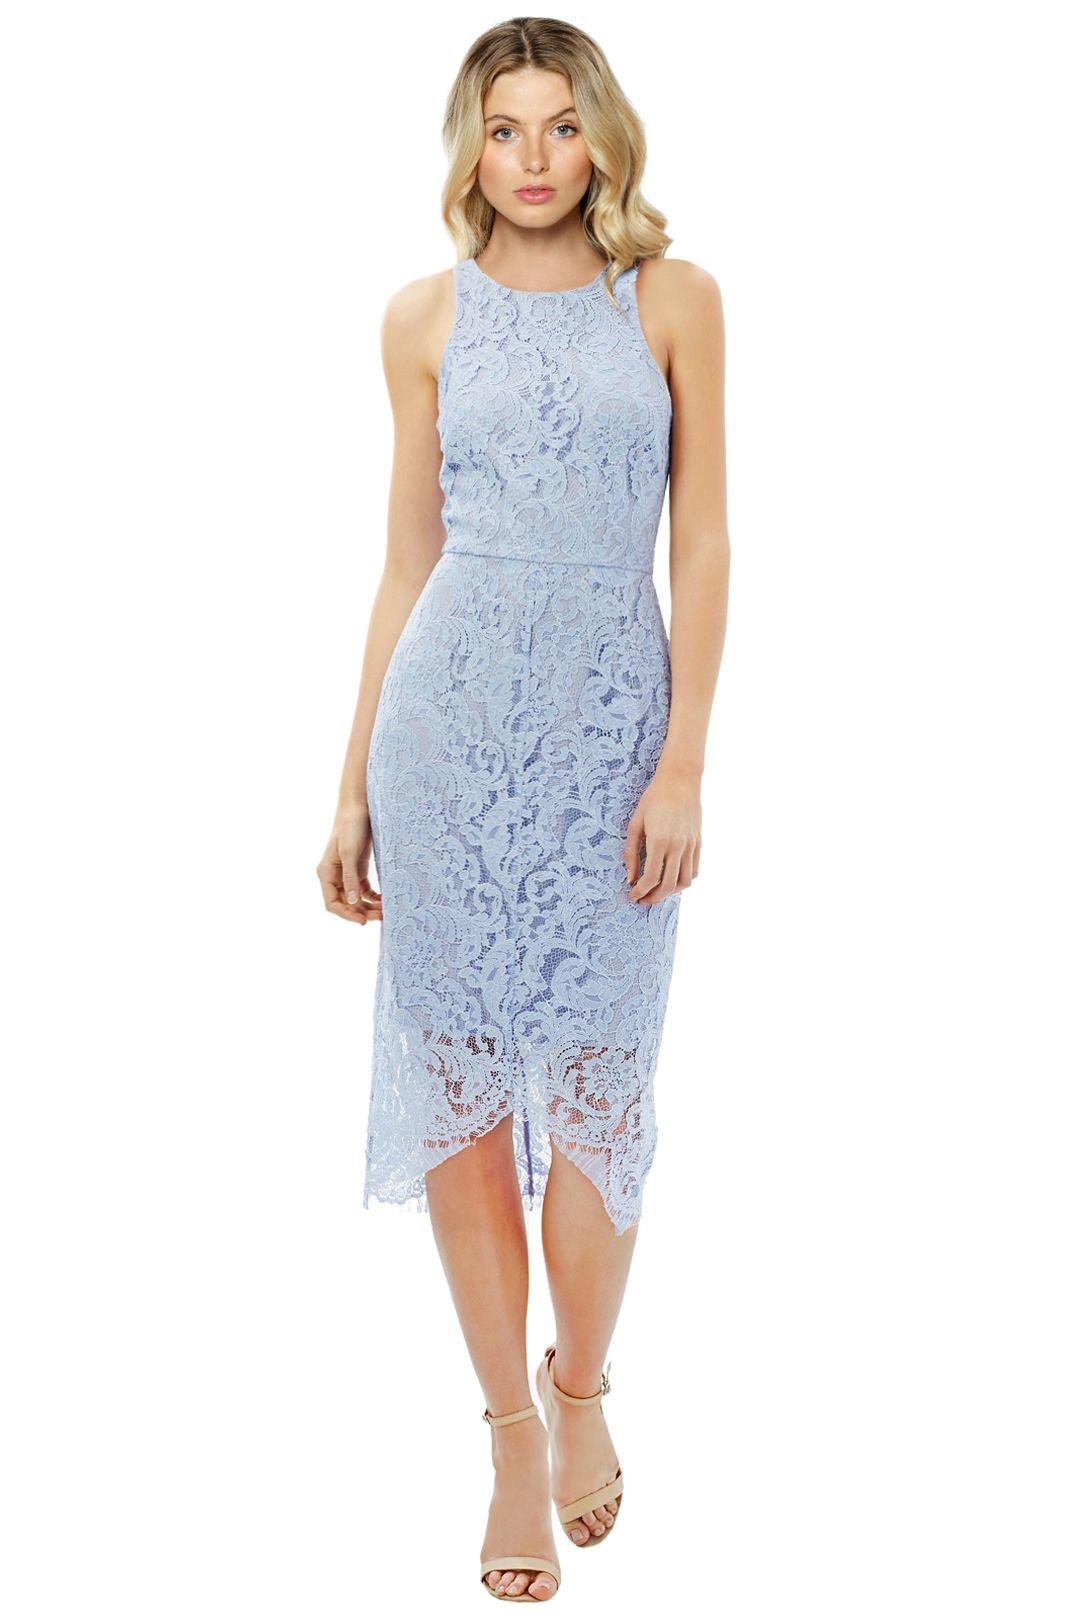 Pilgrim - Ramona Dress - Blue - Front